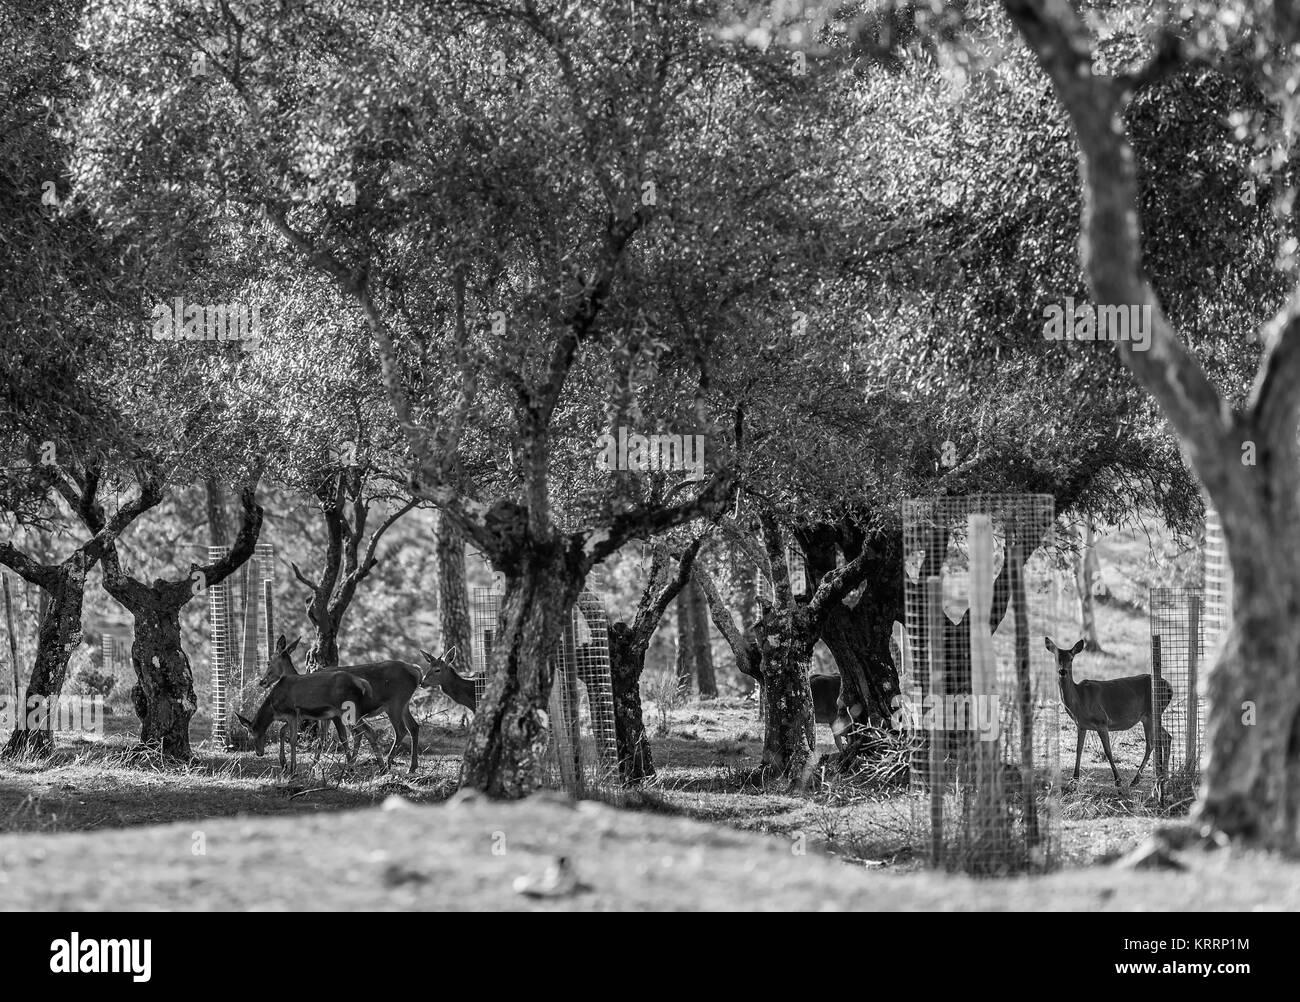 La vida silvestre en el olivar. Imagen De Stock